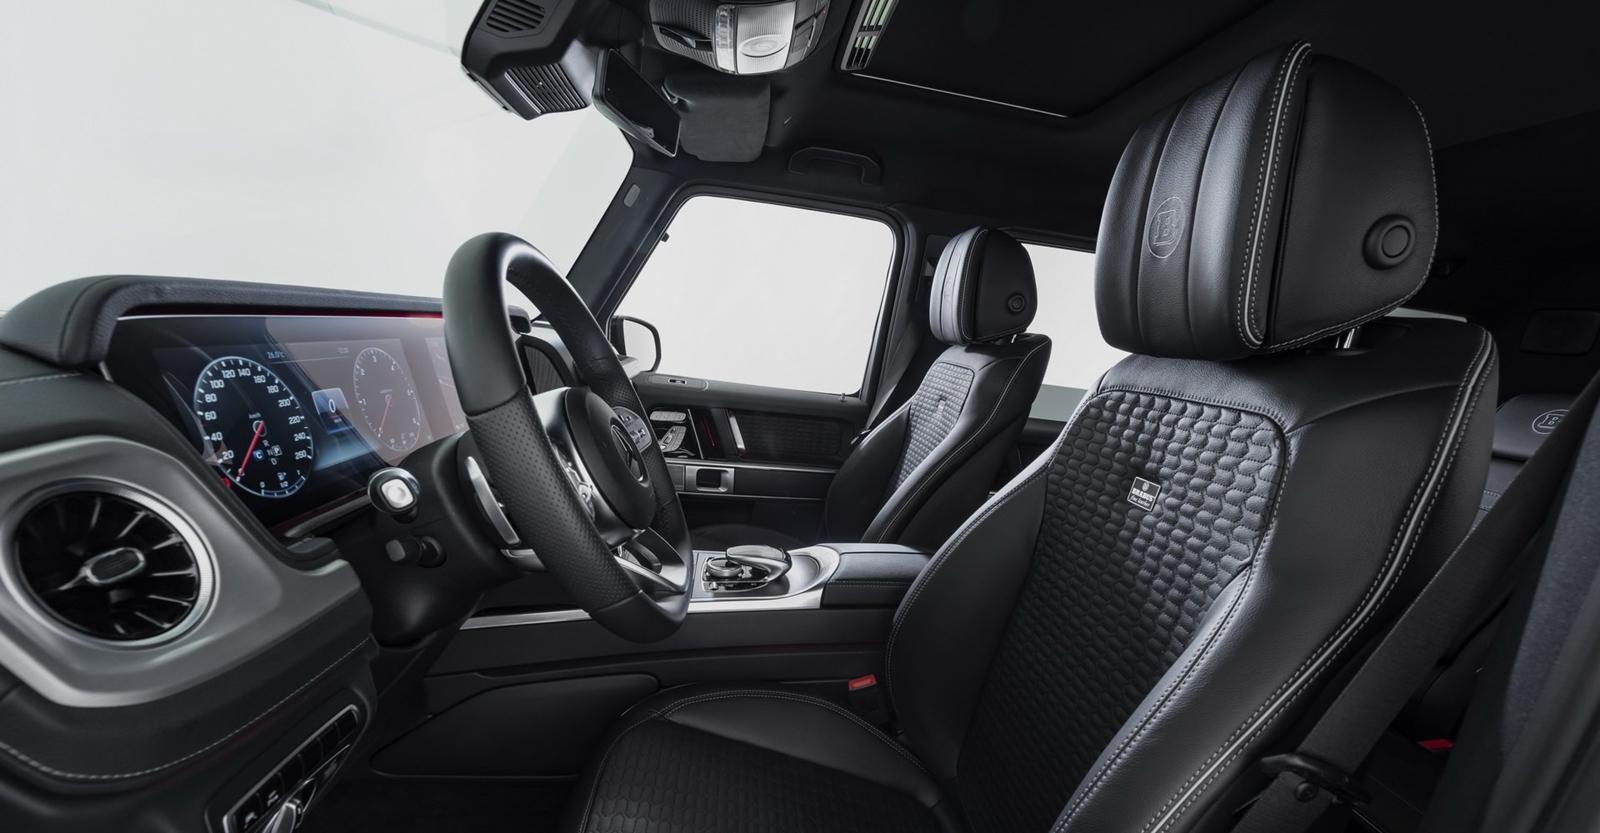 Mercedes Clase G Brabus Adventure (7)